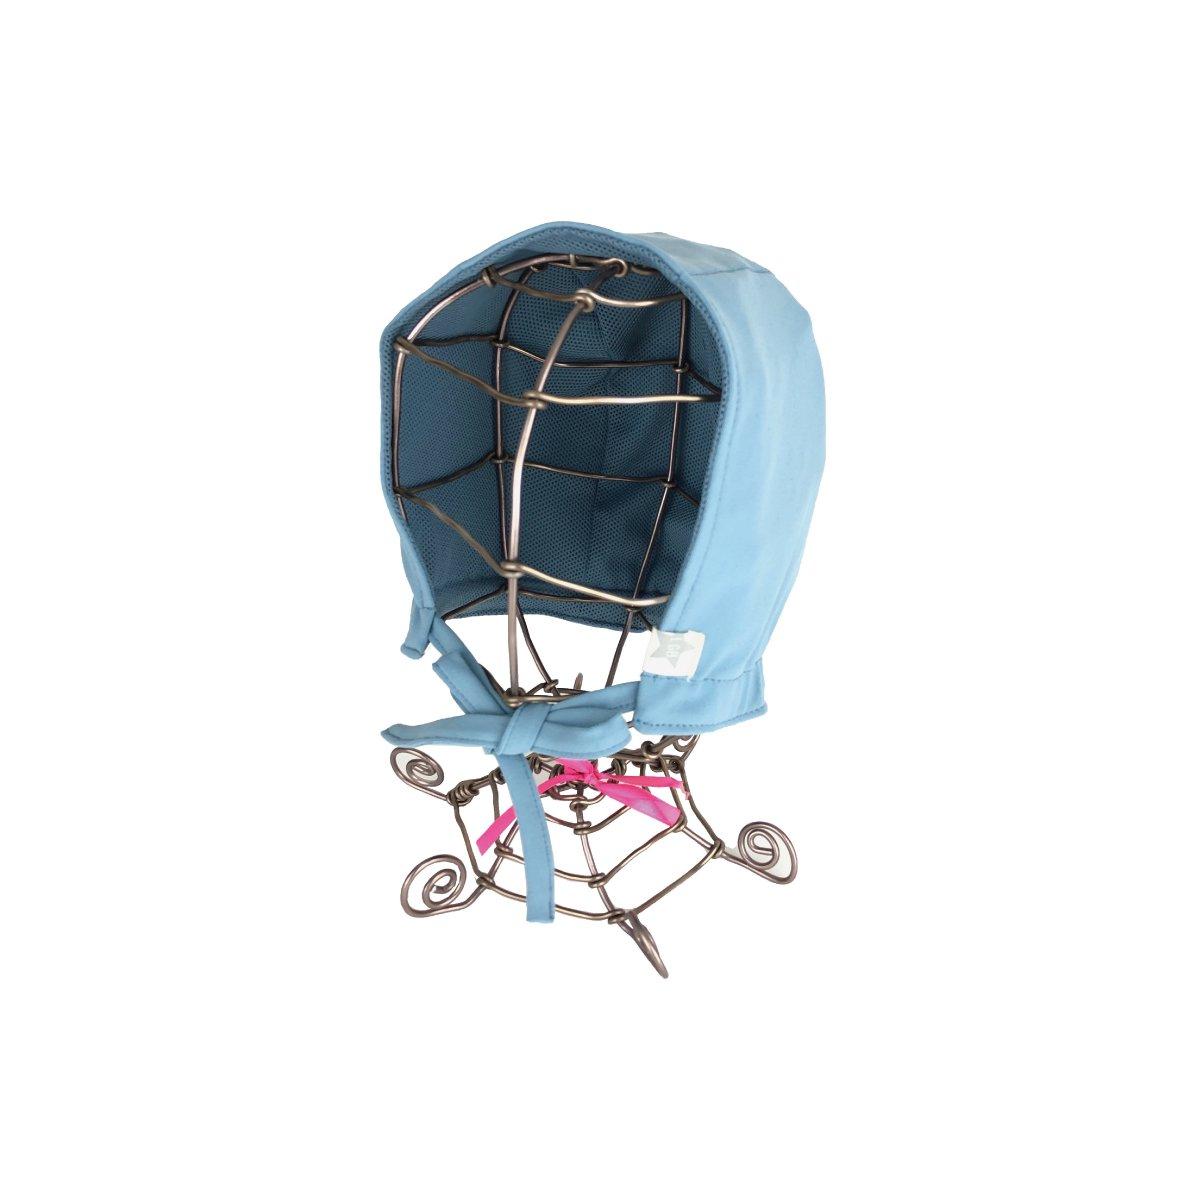 【BABY】Candy Bonnet 詳細画像5